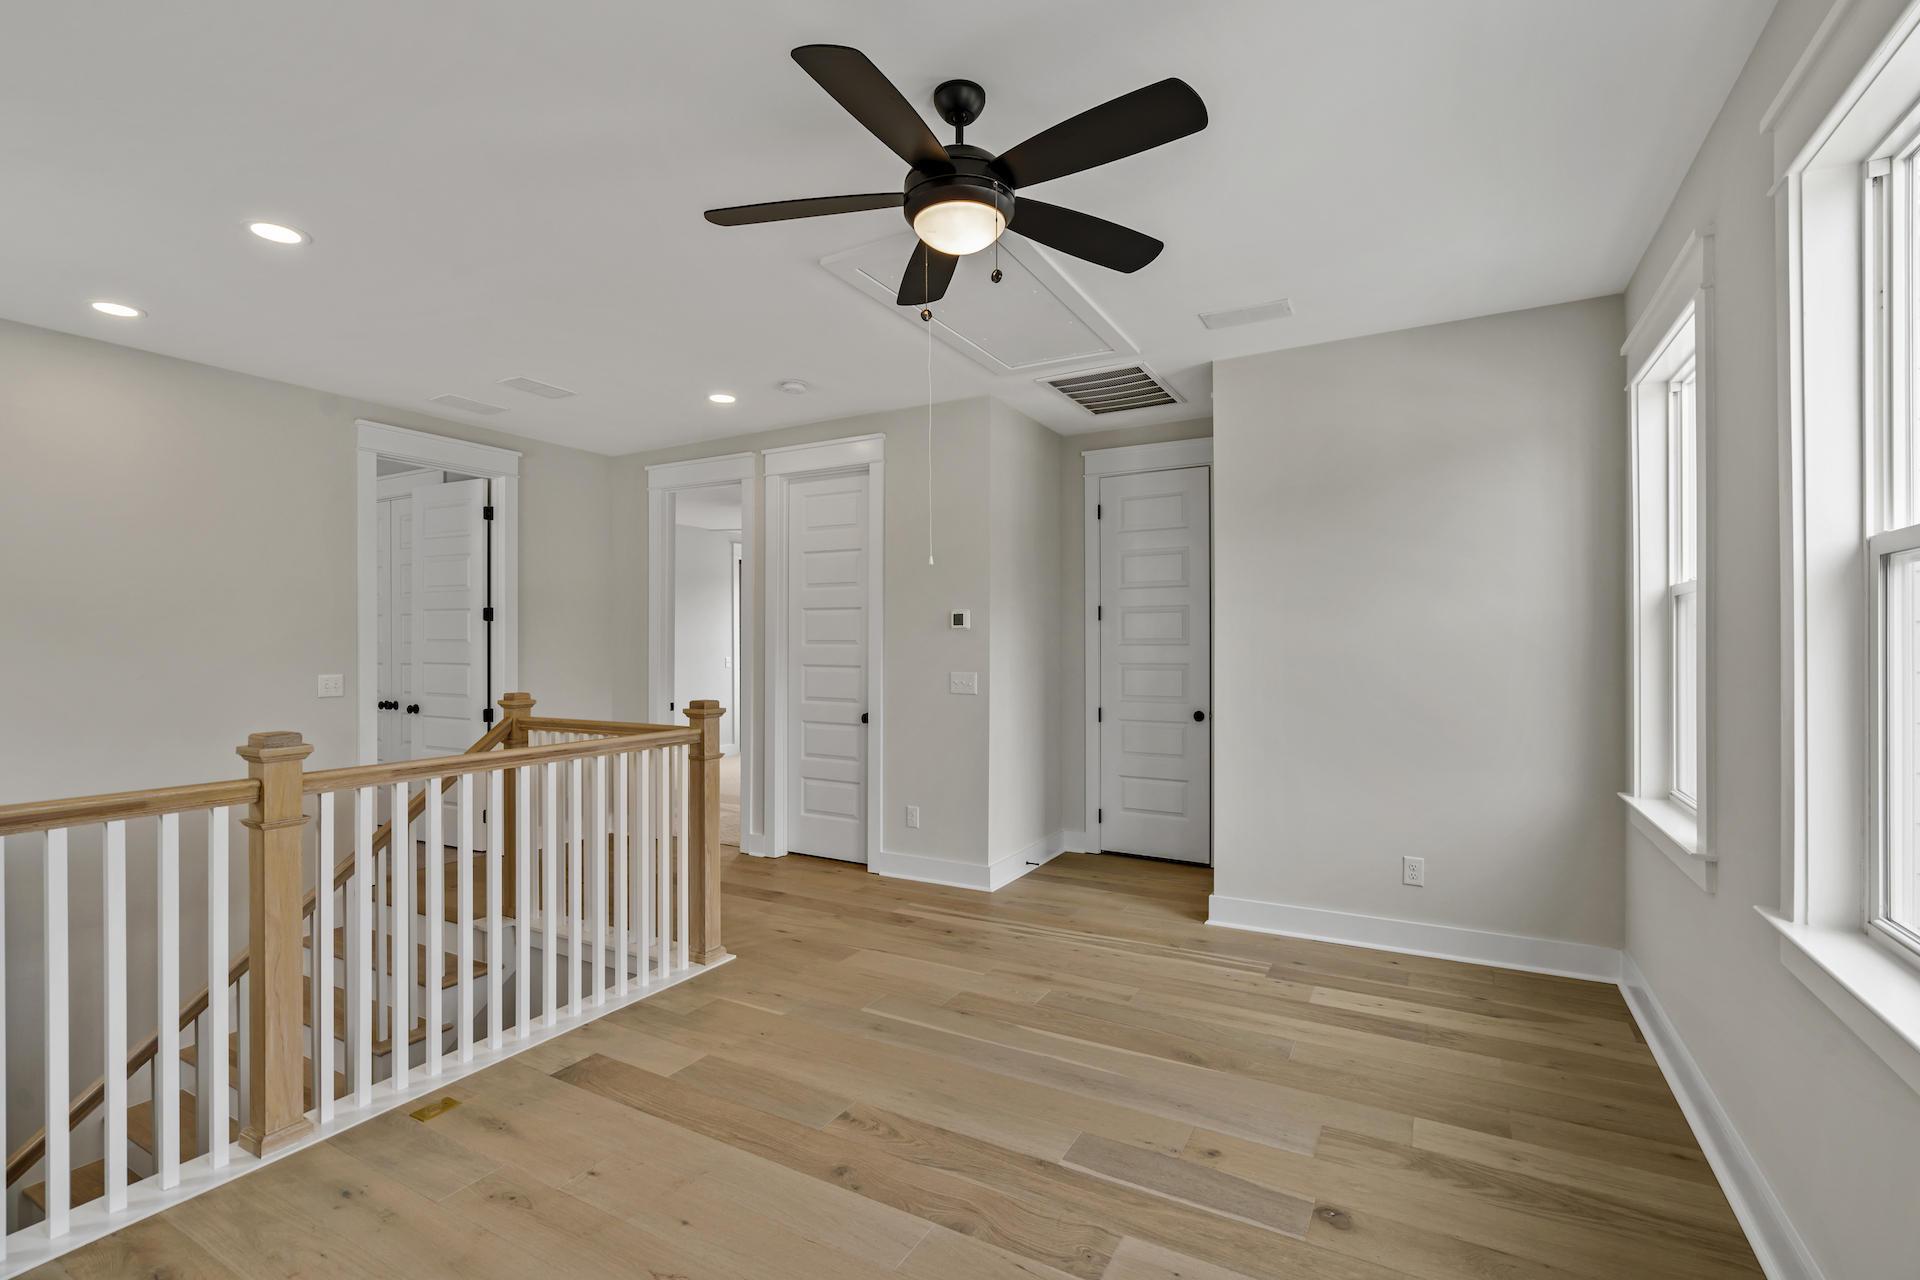 Midtown Homes For Sale - 1320 Upper Union, Mount Pleasant, SC - 22